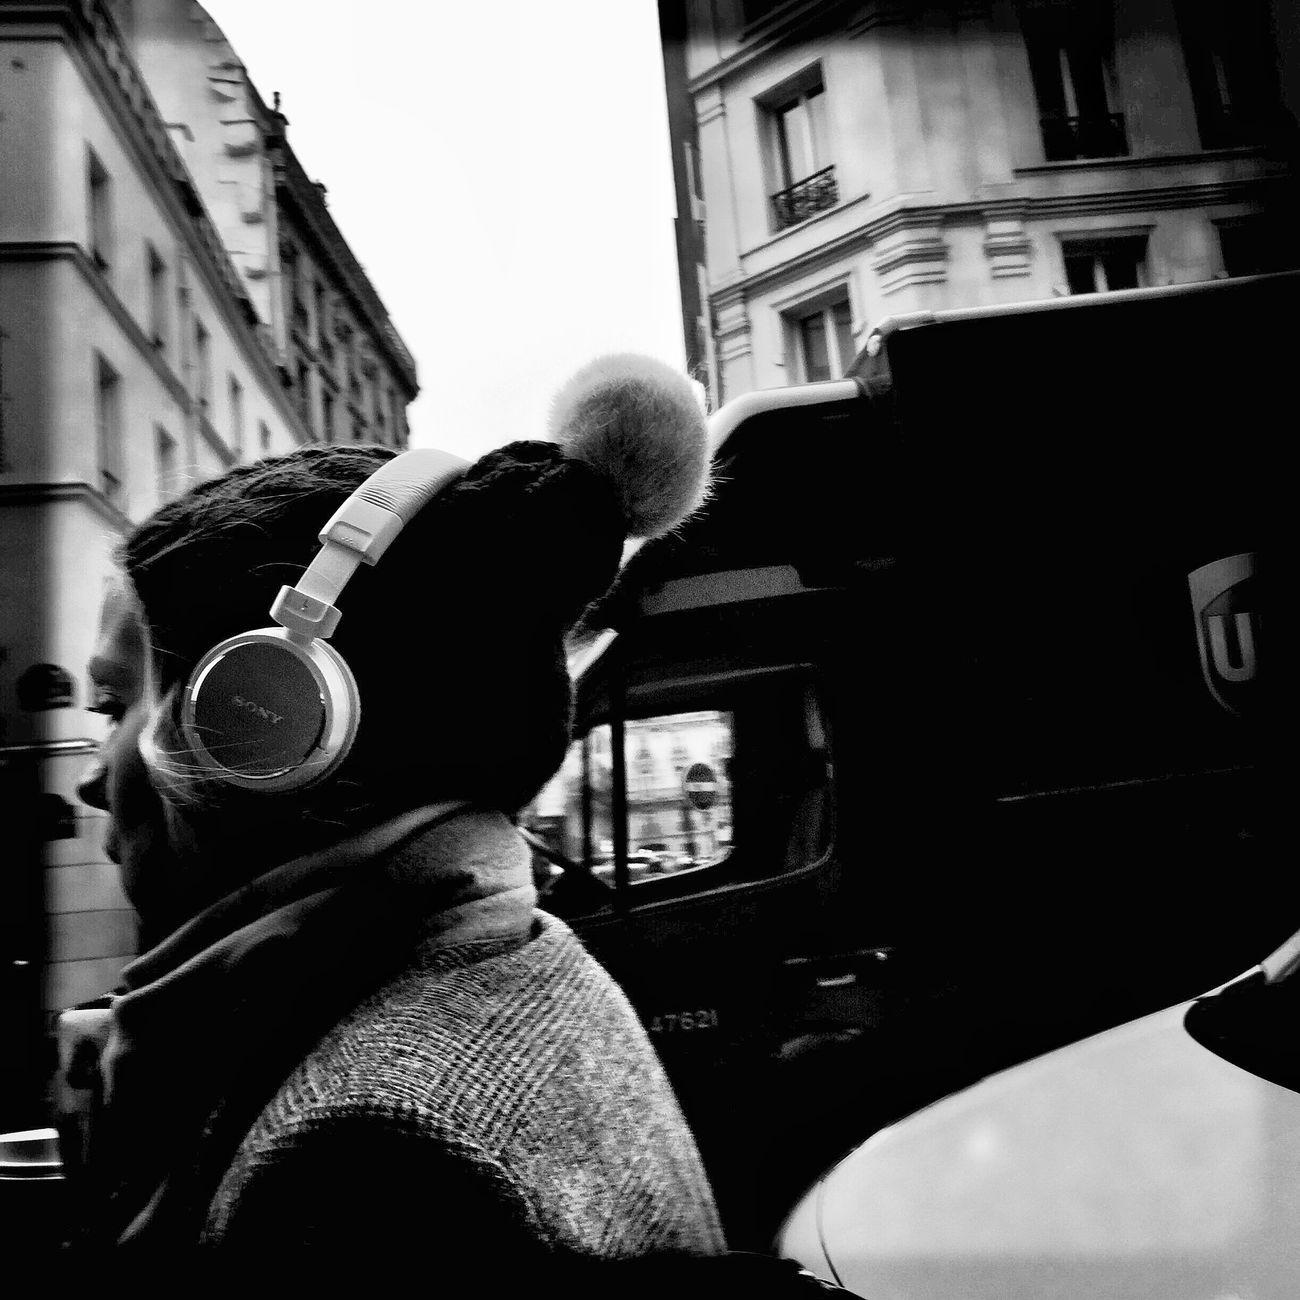 Paris Street Streetphotography Streetart Monochrome